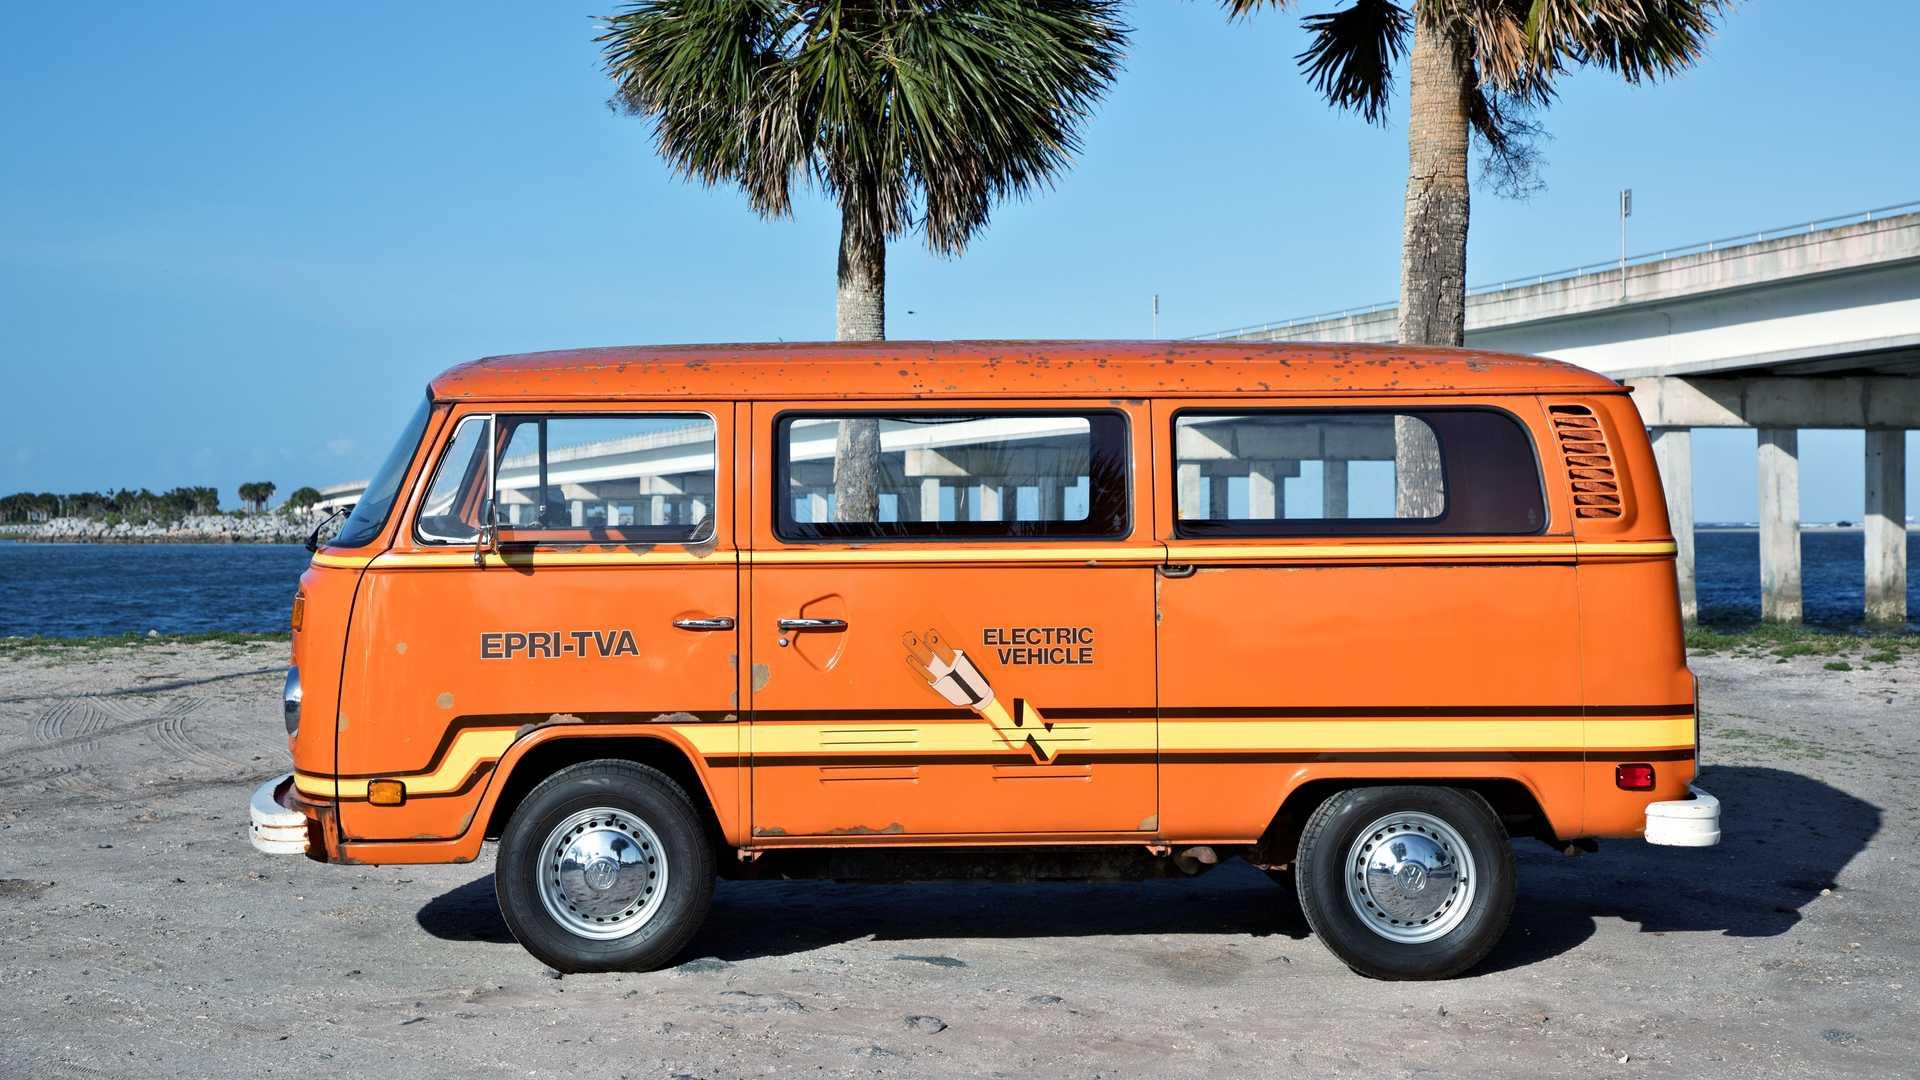 Лучшие новости об электромобиле Volkswagen из 1970-х